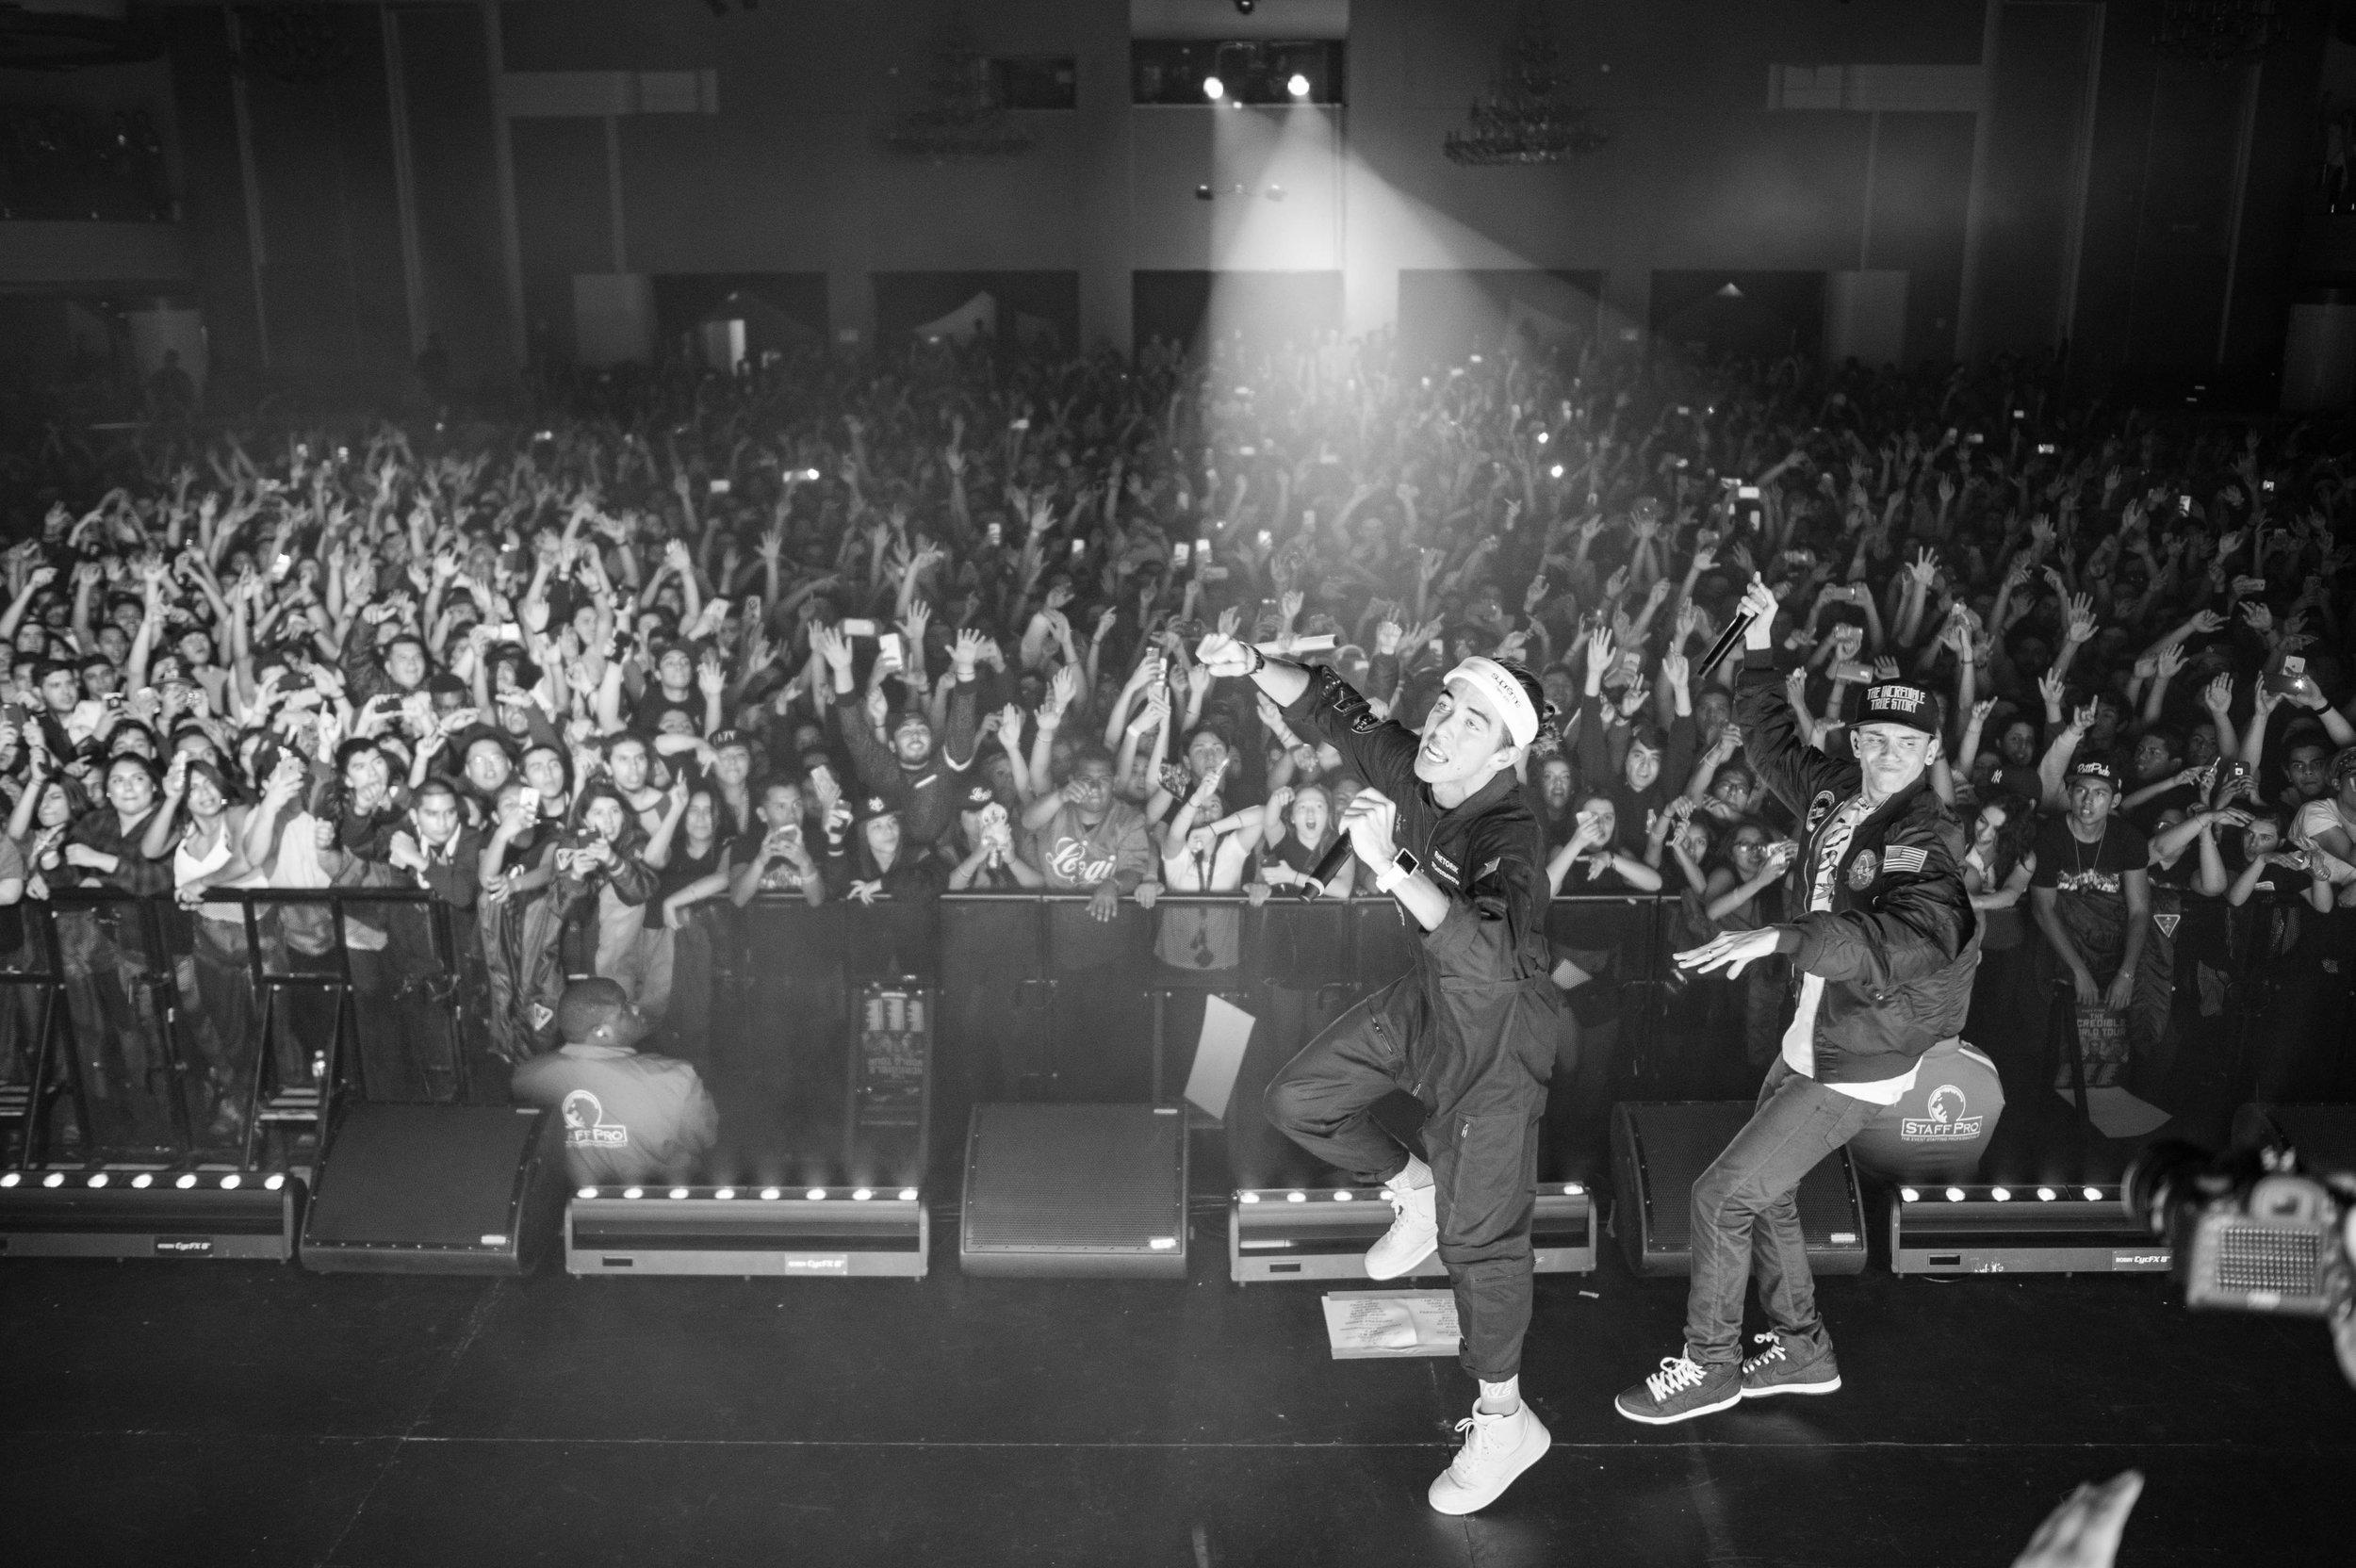 Logic and Rhetorik rocking a sold out crowd in LA